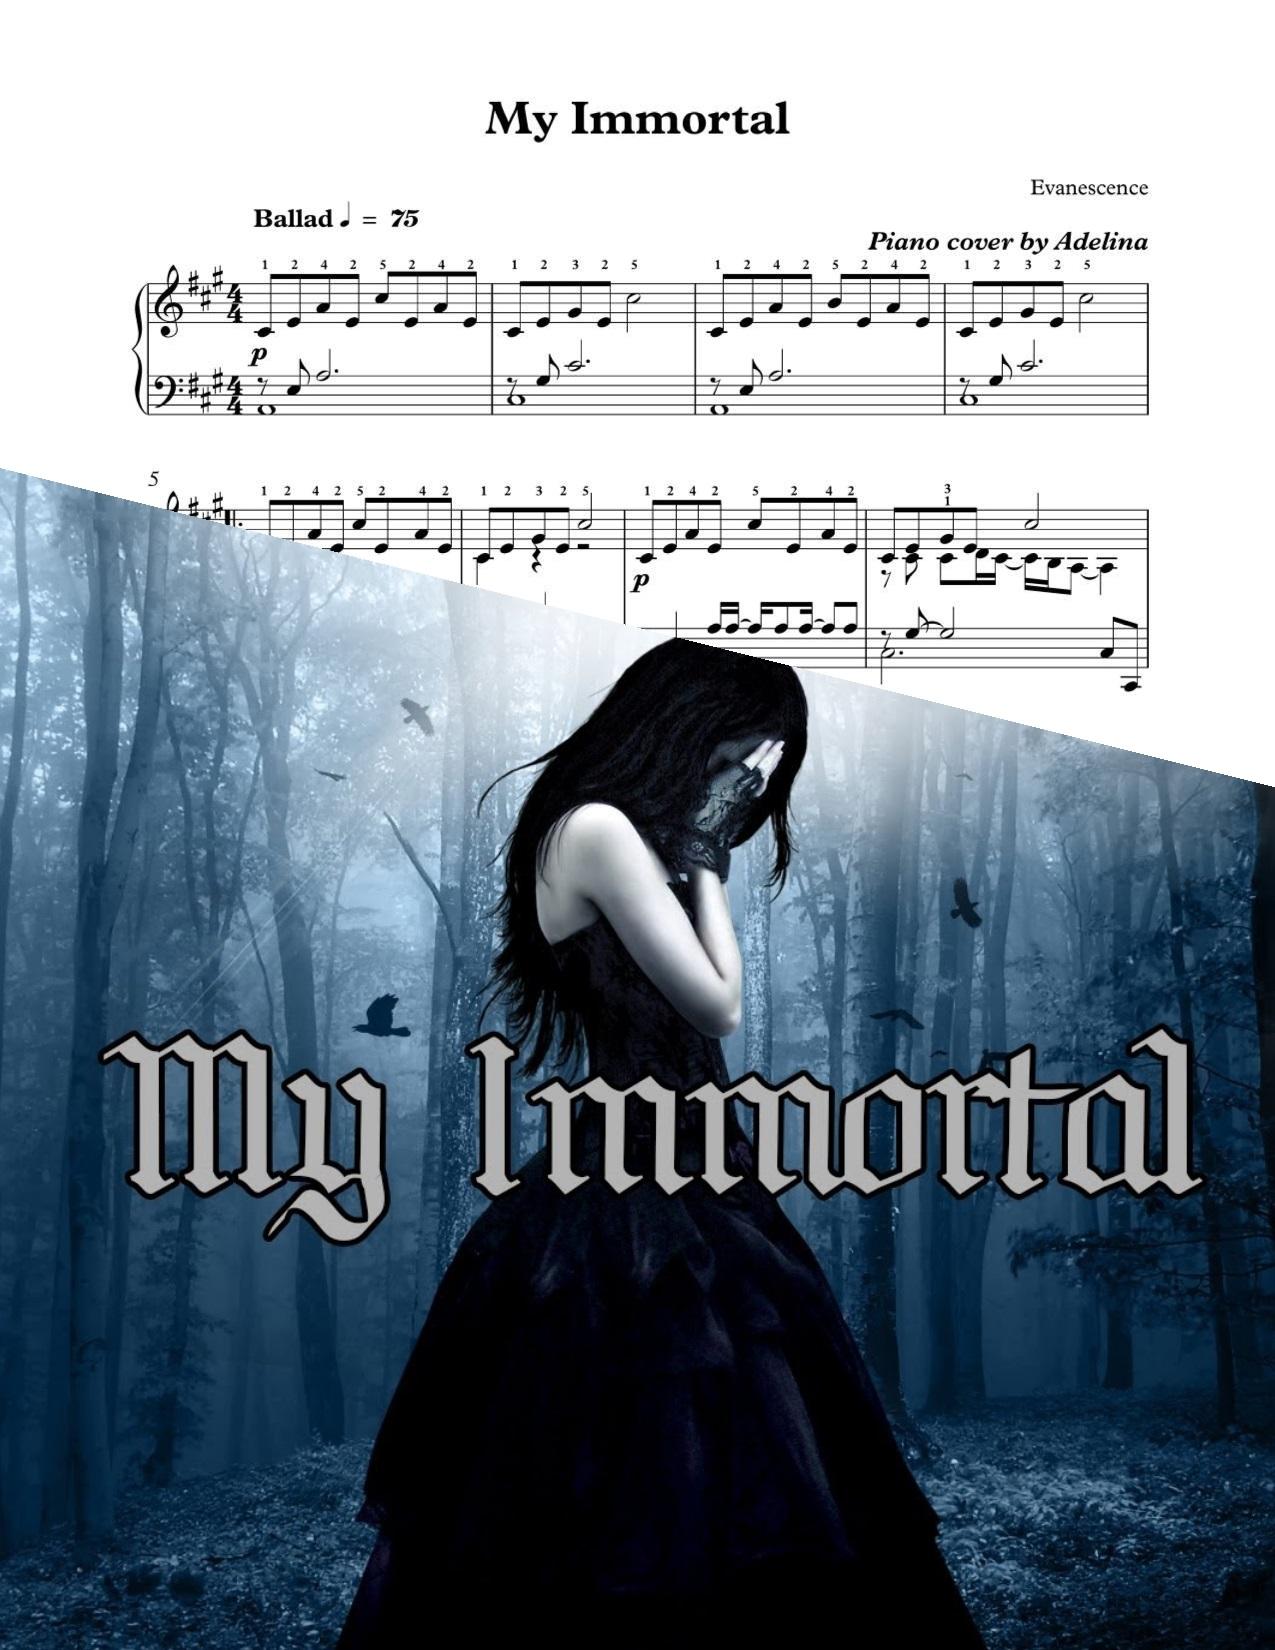 übersetzung My Immortal